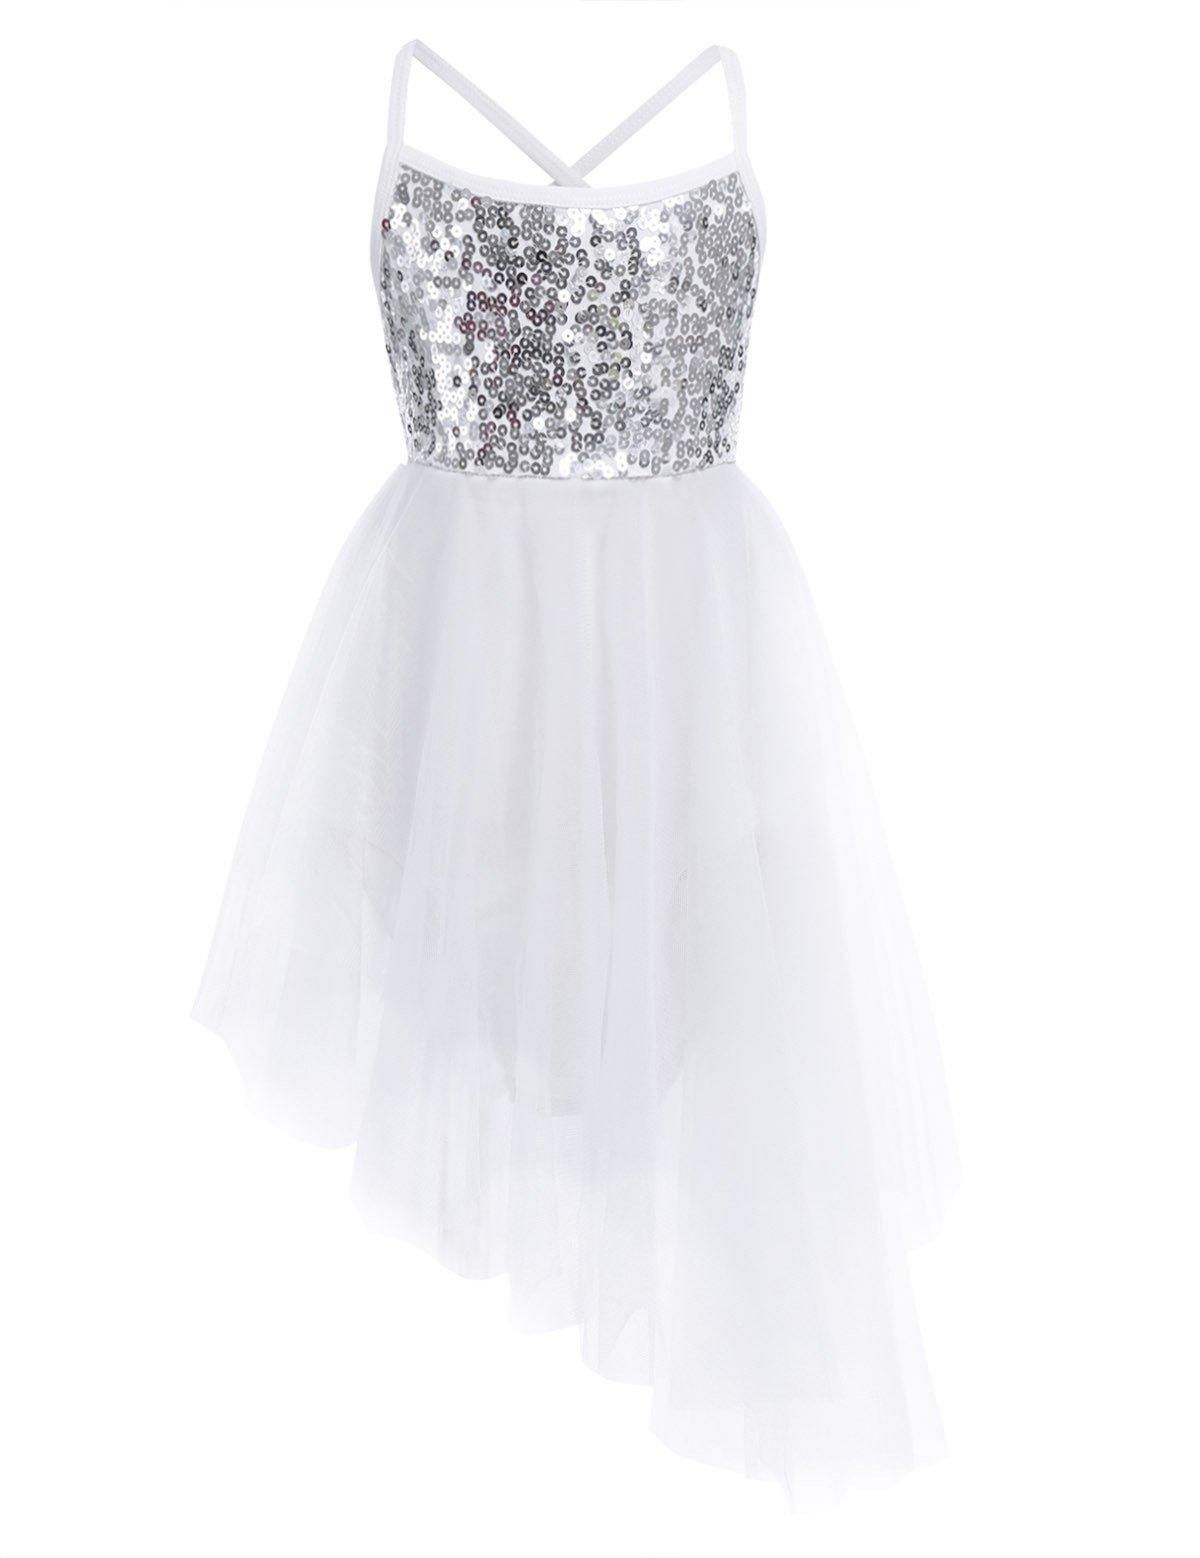 iiniim Kids Girls' Sleeveless Sequined Ballet Leotard Outfit Dance Tutu Dress, Hi-lo Silver White, 7-8